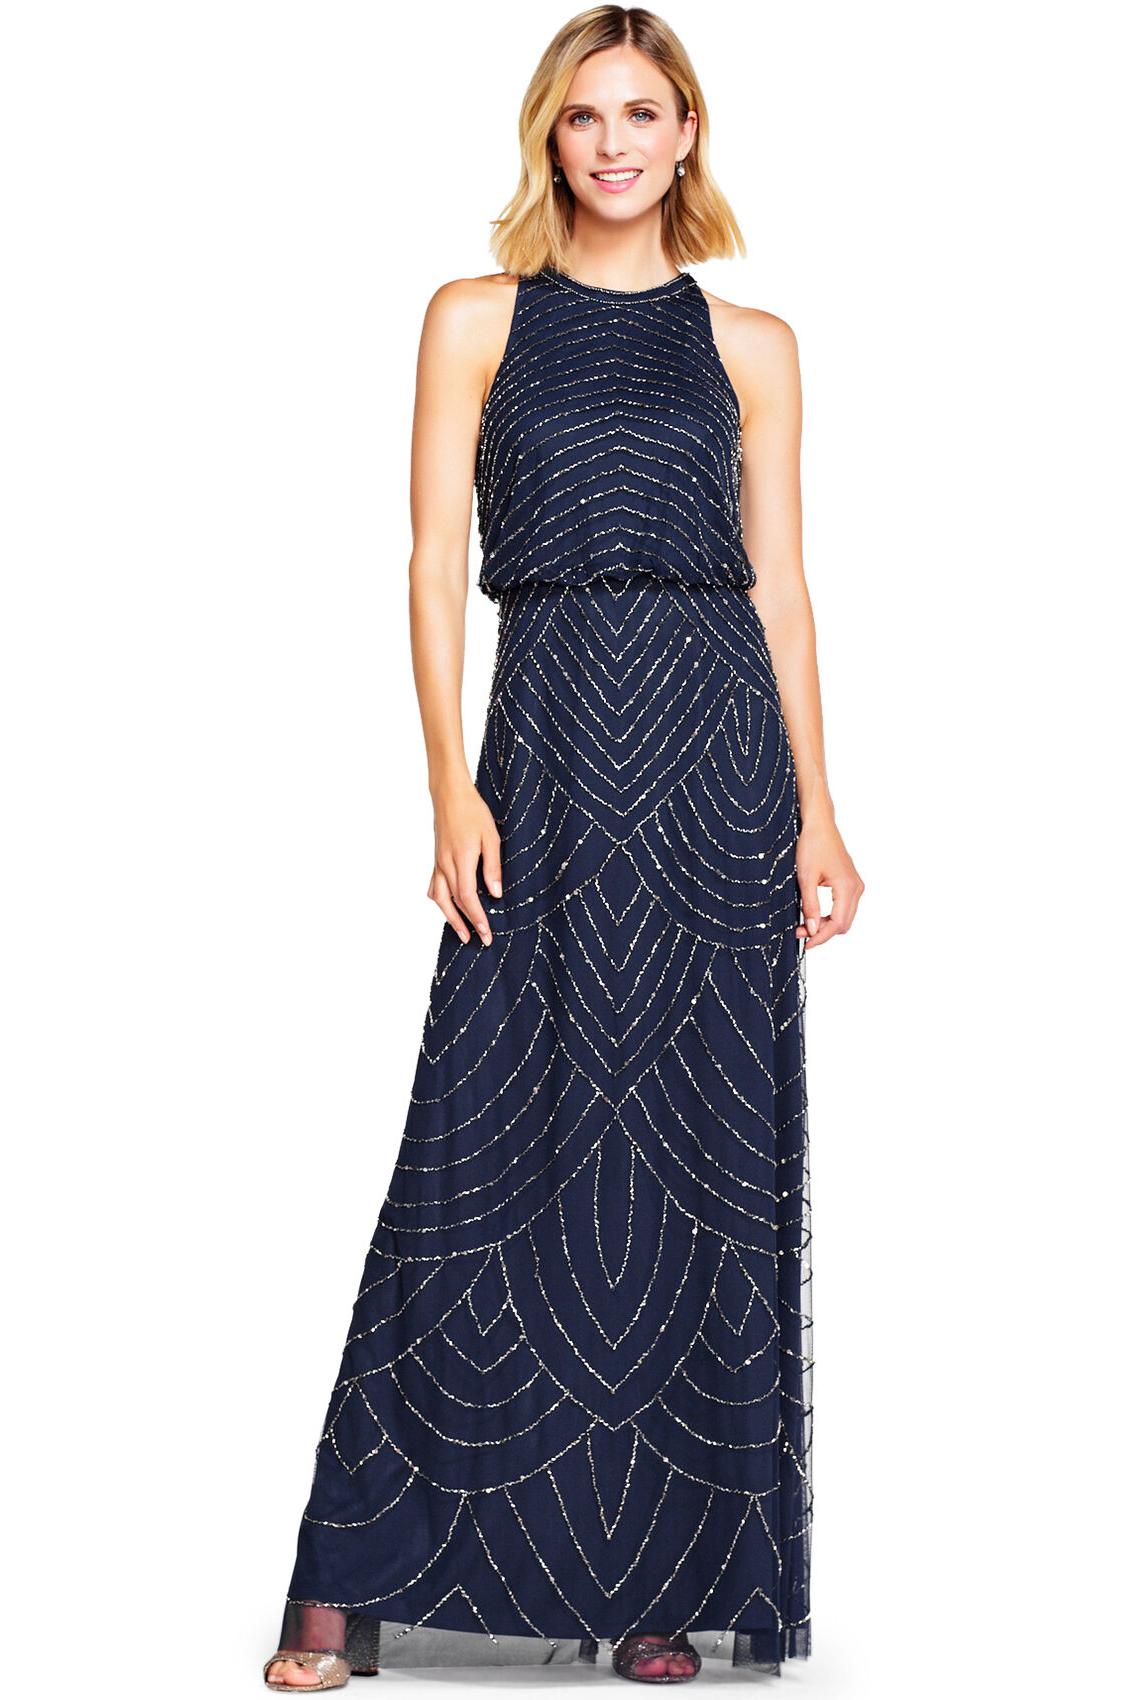 Nouveau Halter Art Deco Beaded Blouson Dress By Adrianna Papell - Navy